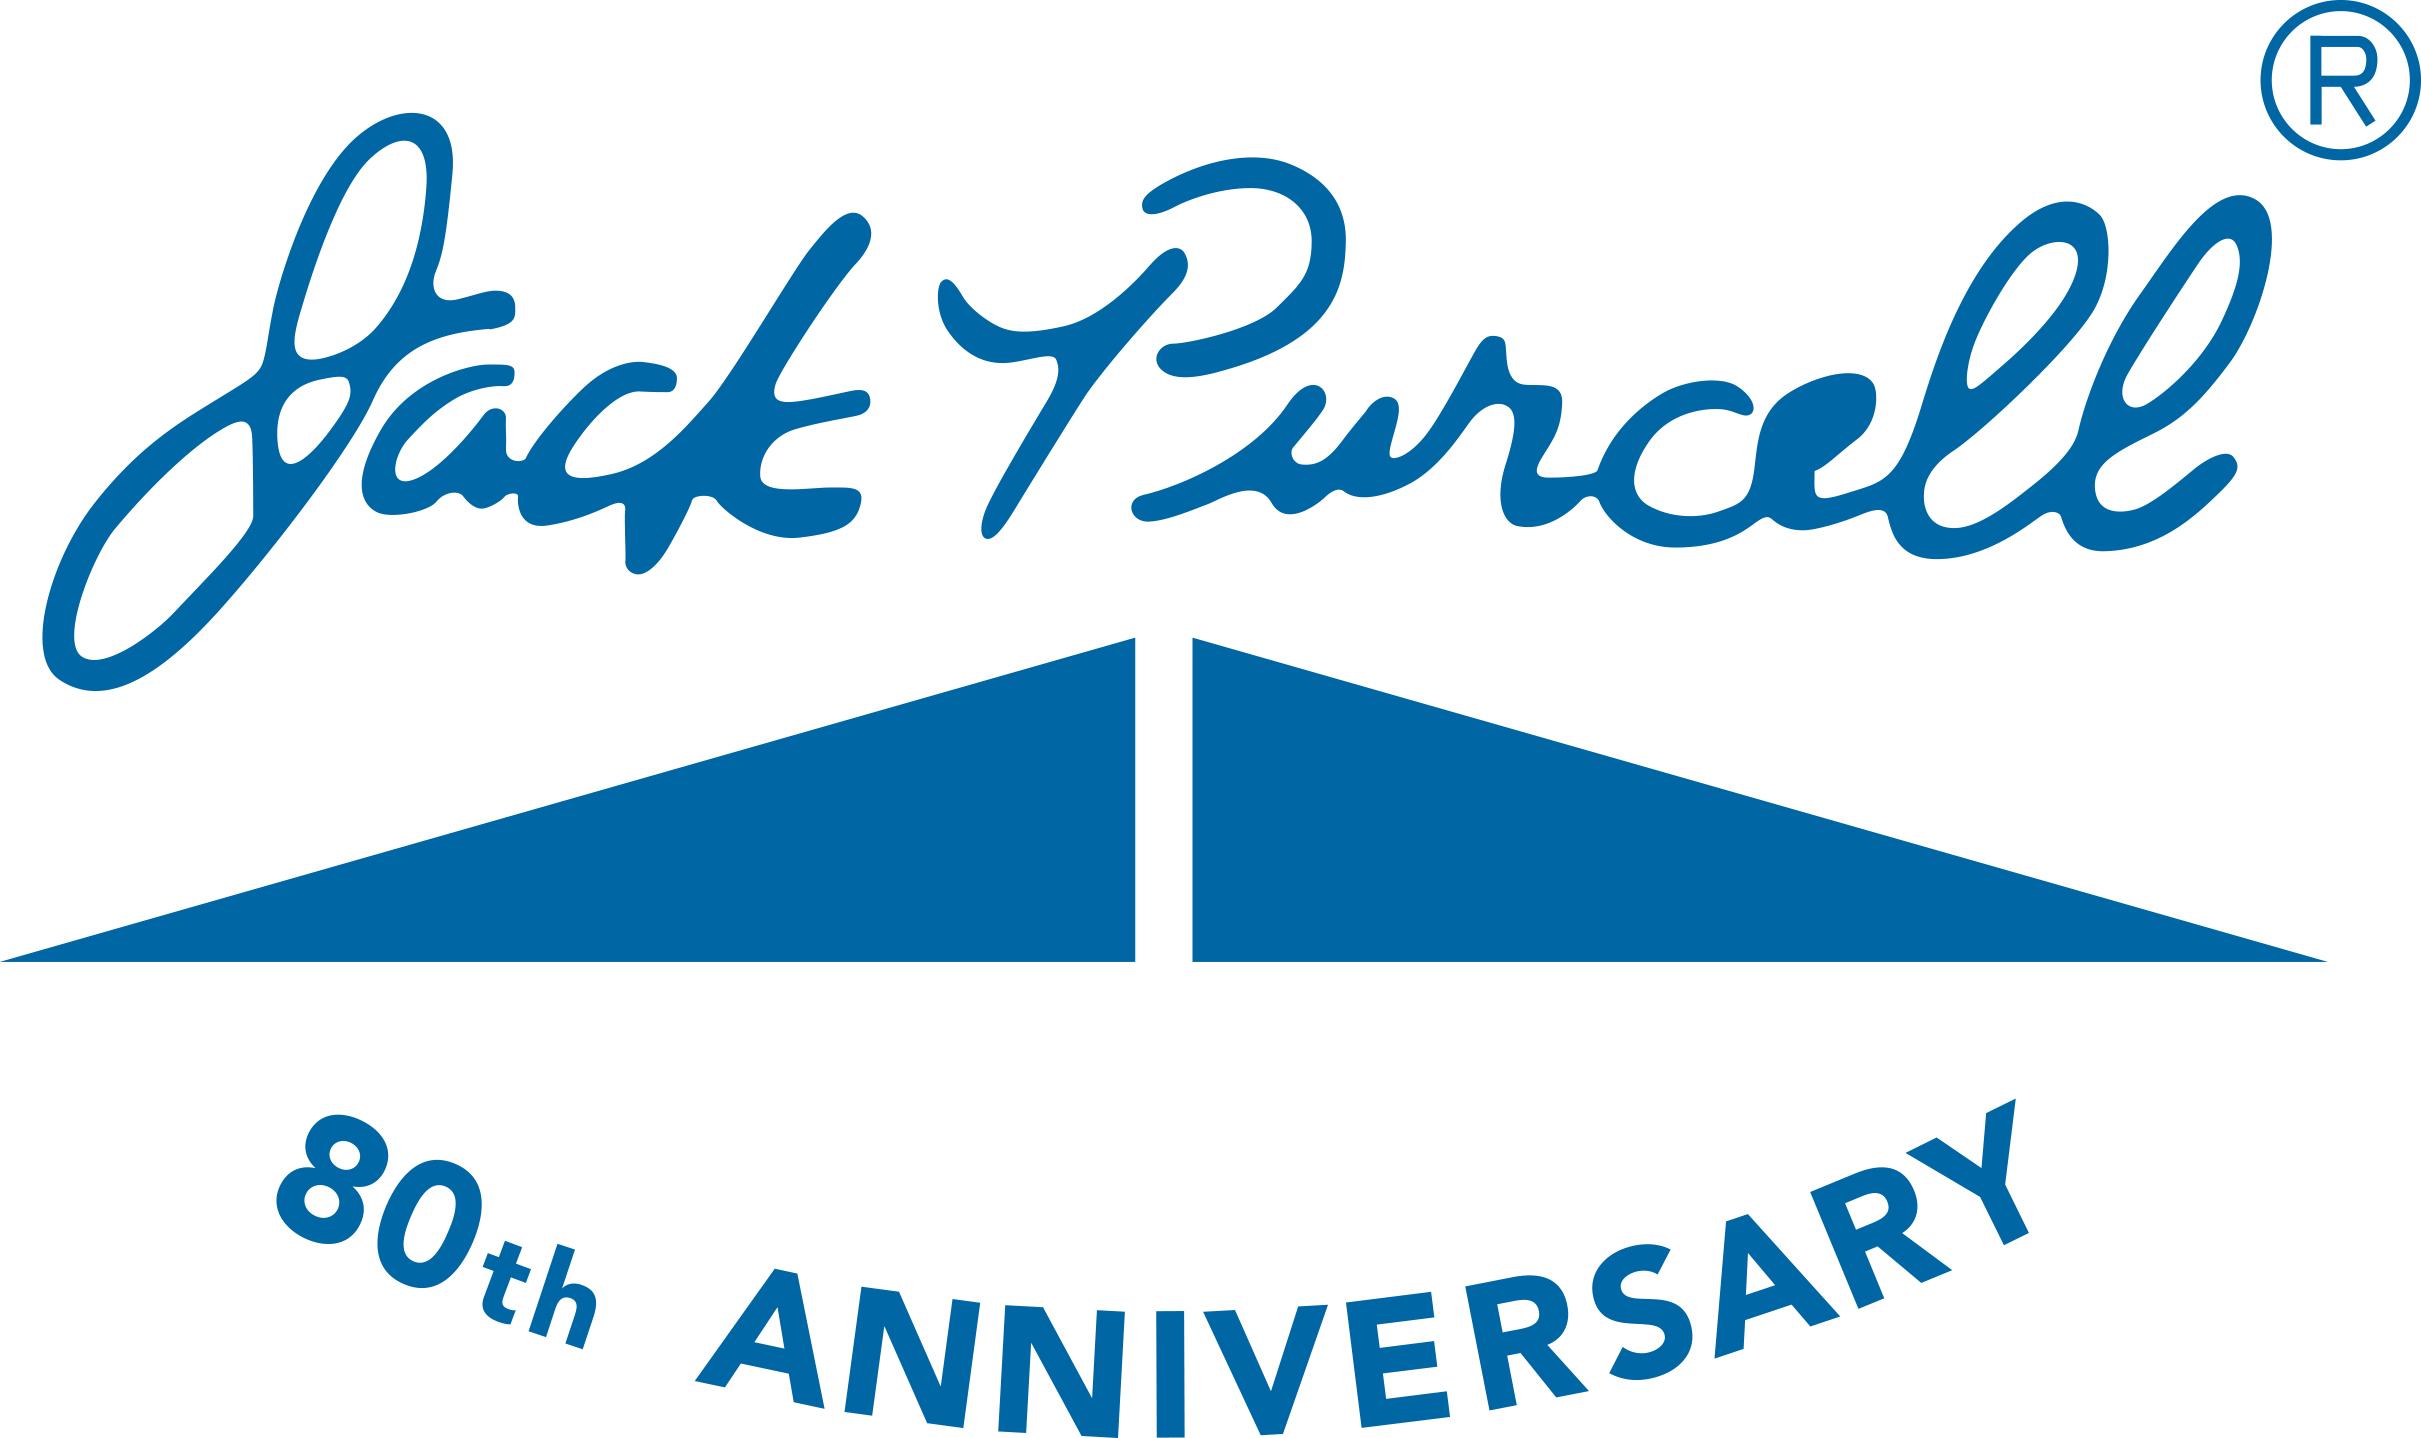 Jack_Purecell_80th_Logo(Fix)